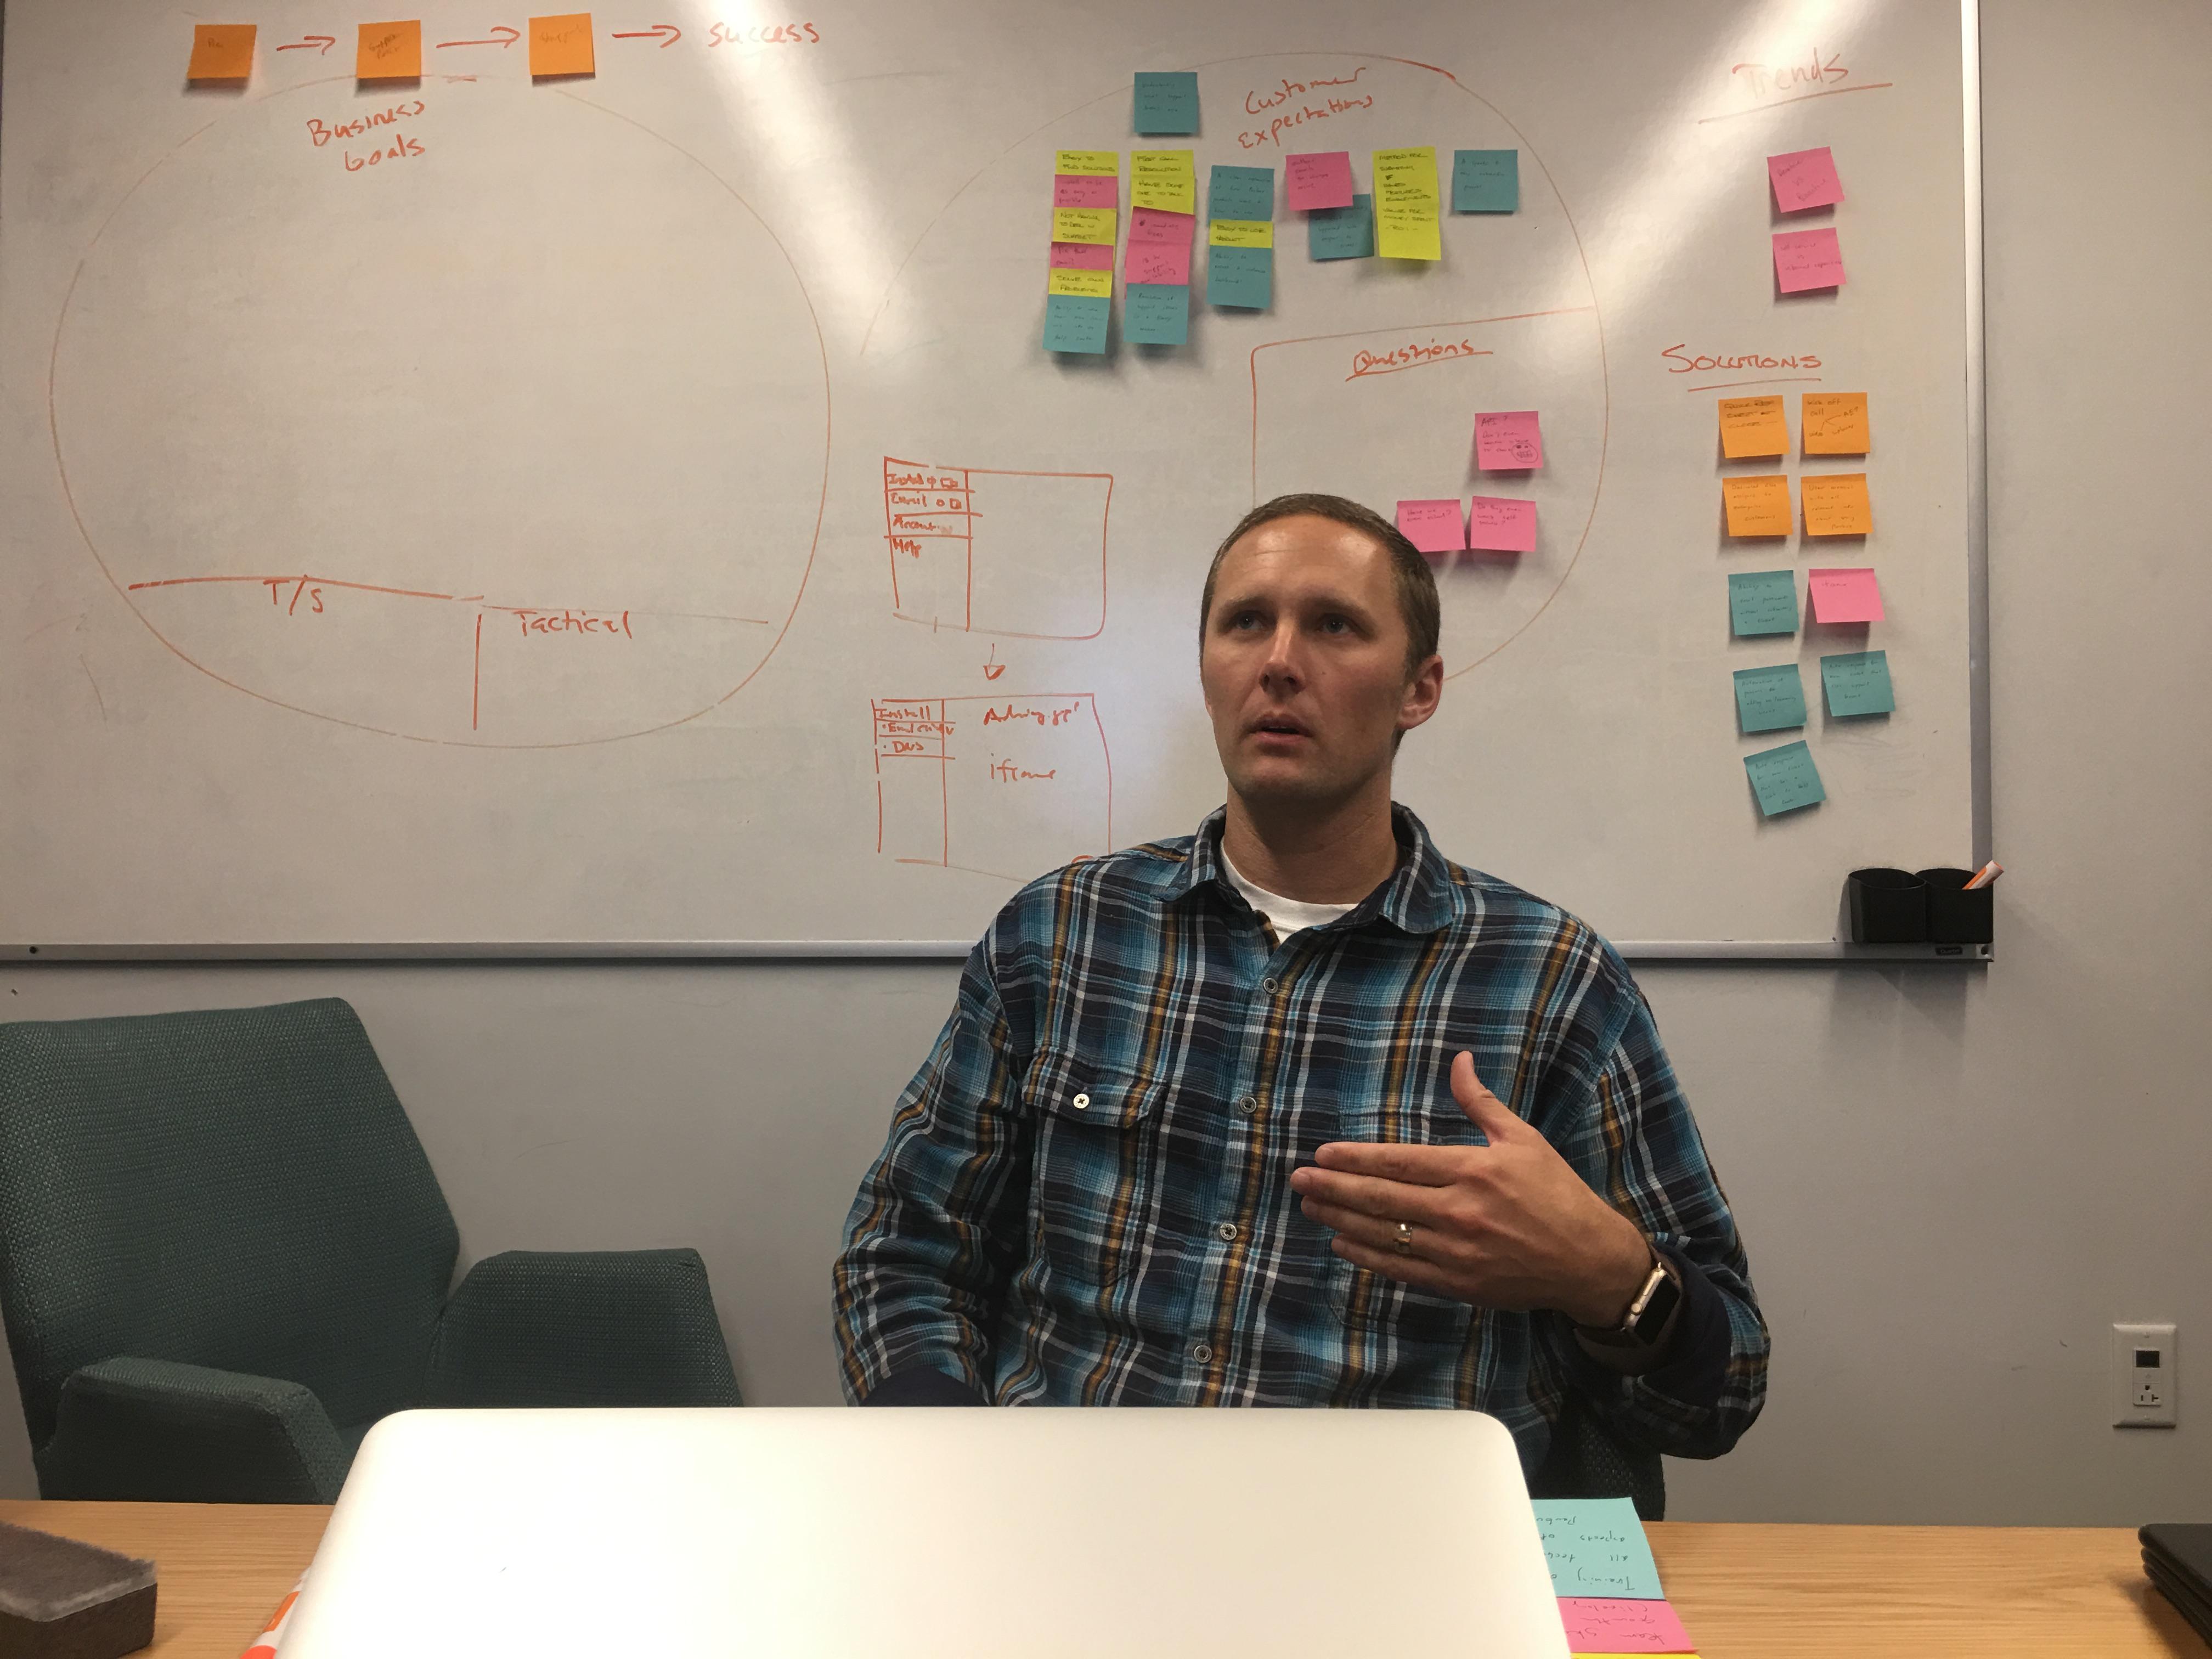 How Do I Develop a Customer Health Score? - Paubox, Sean Hookano-Briel